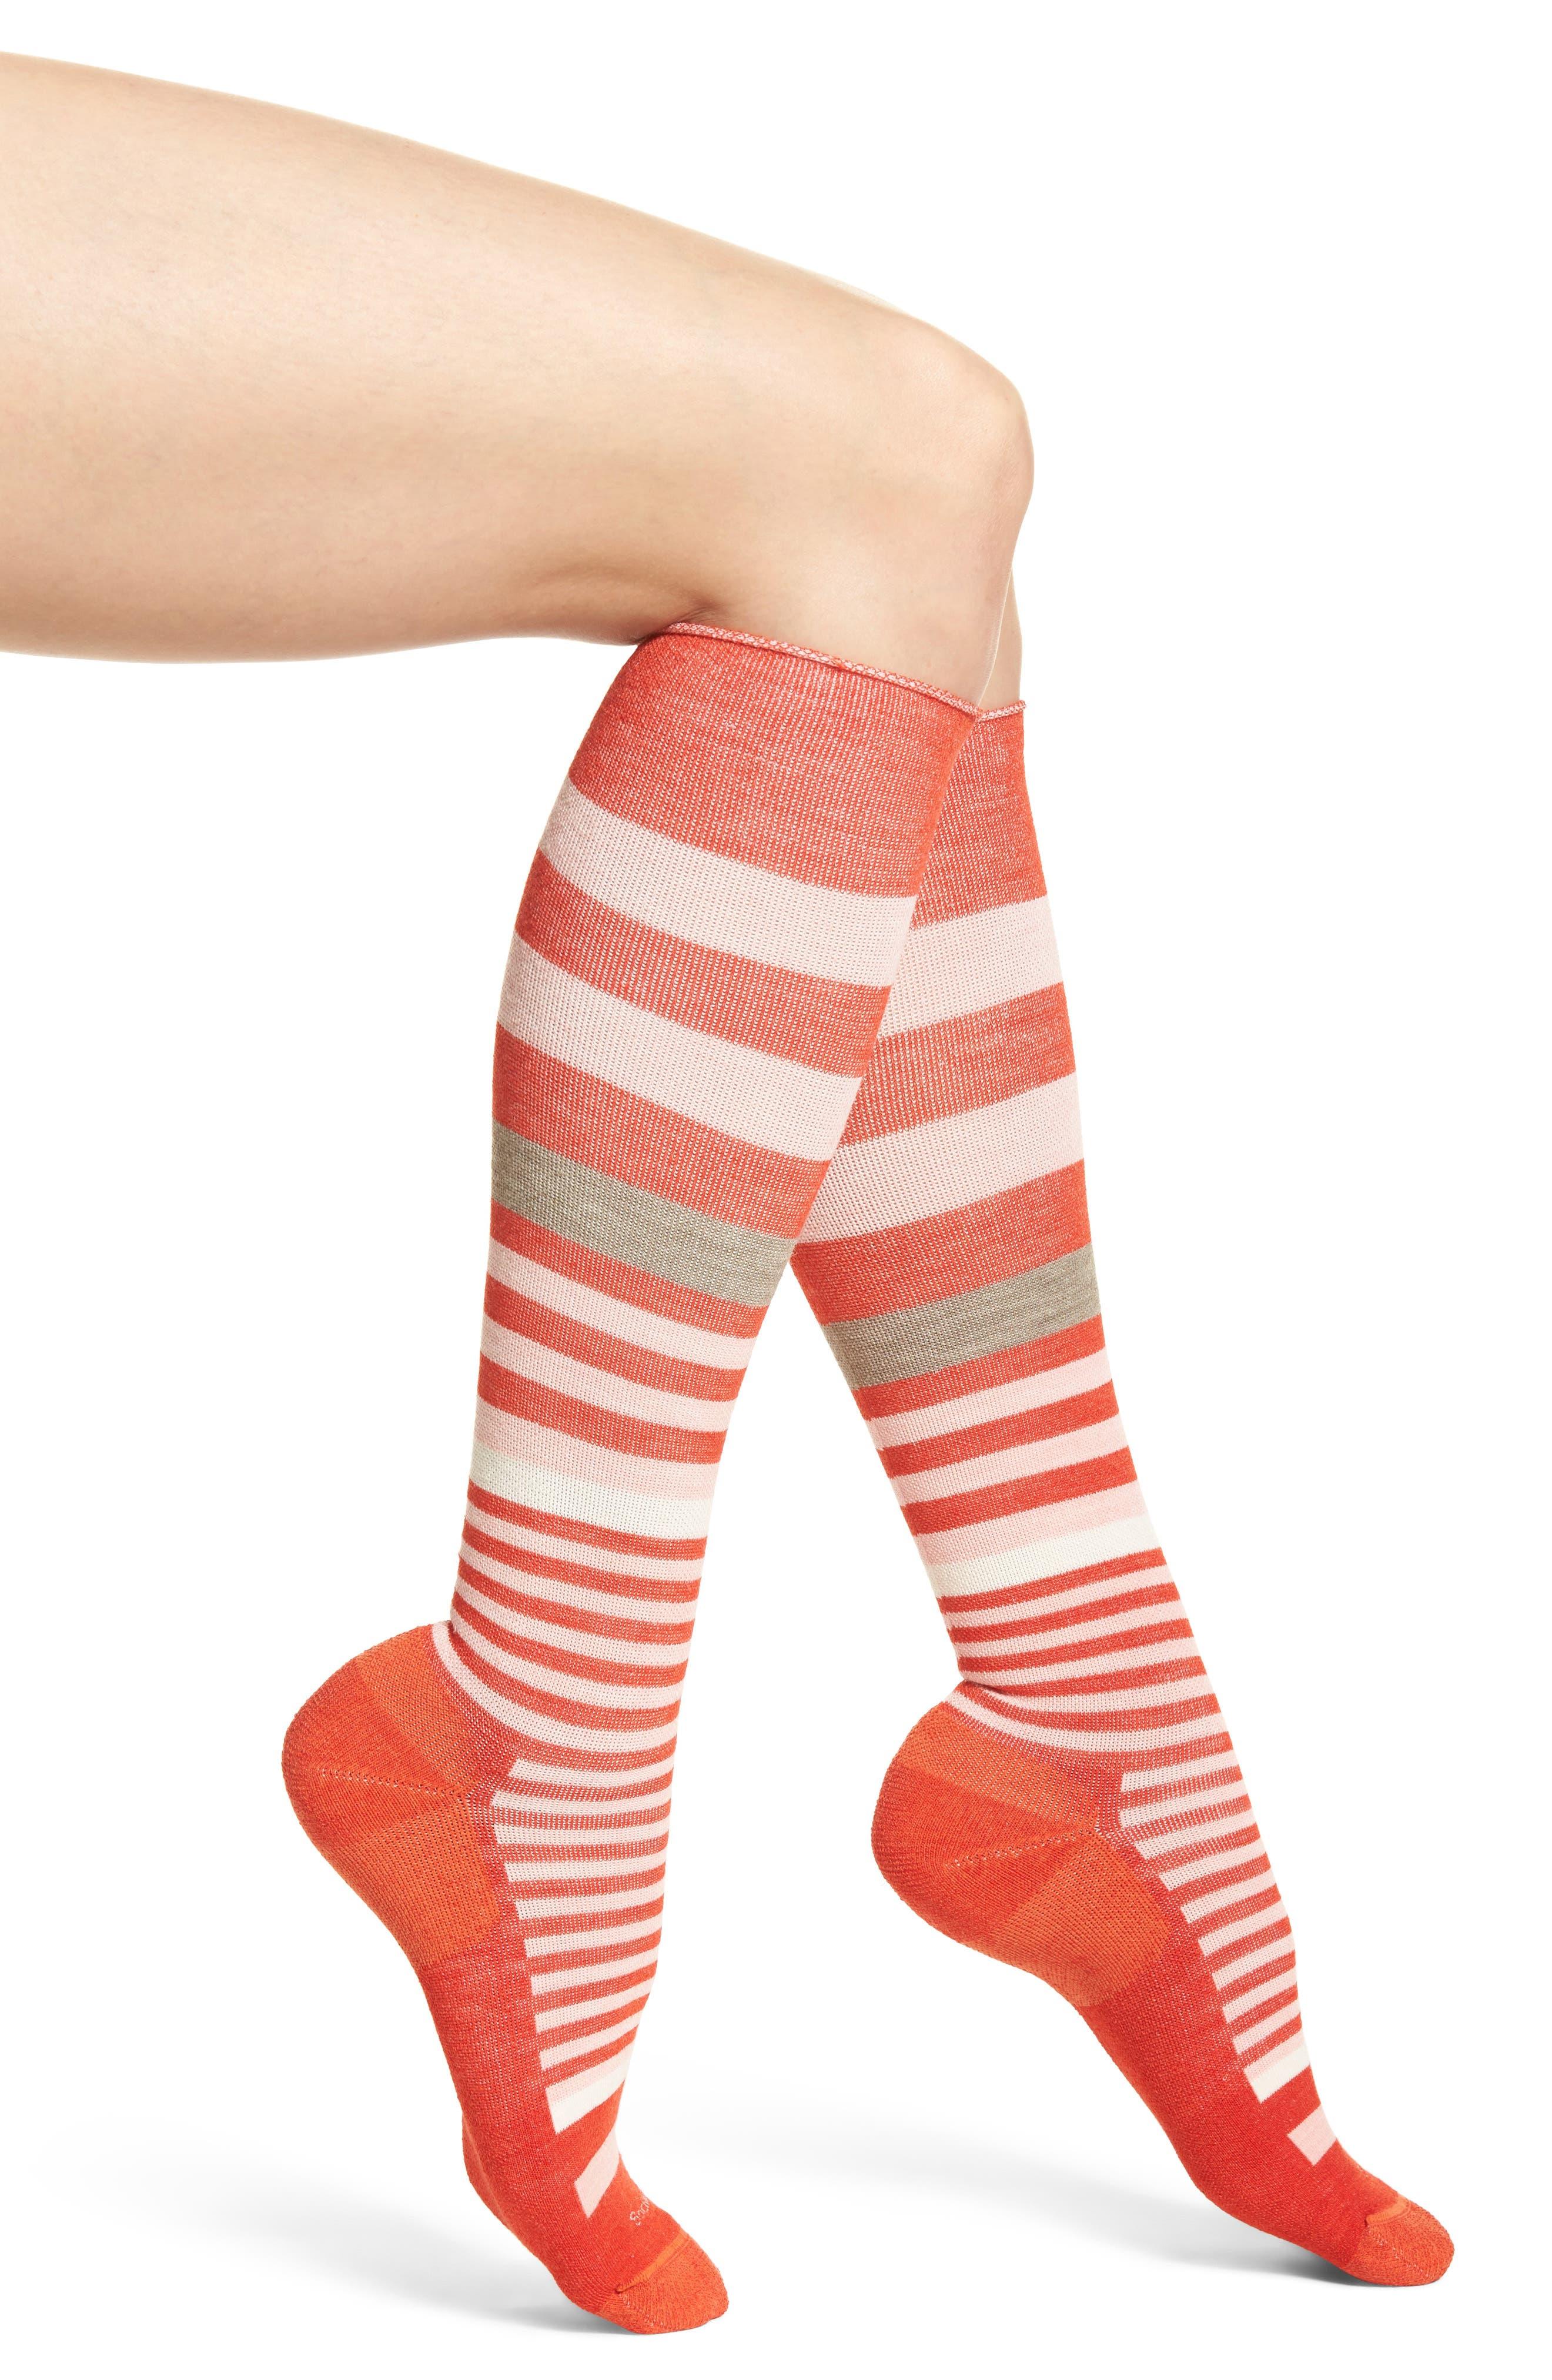 'Orbital' Compression Knee Socks,                             Main thumbnail 1, color,                             Poppy